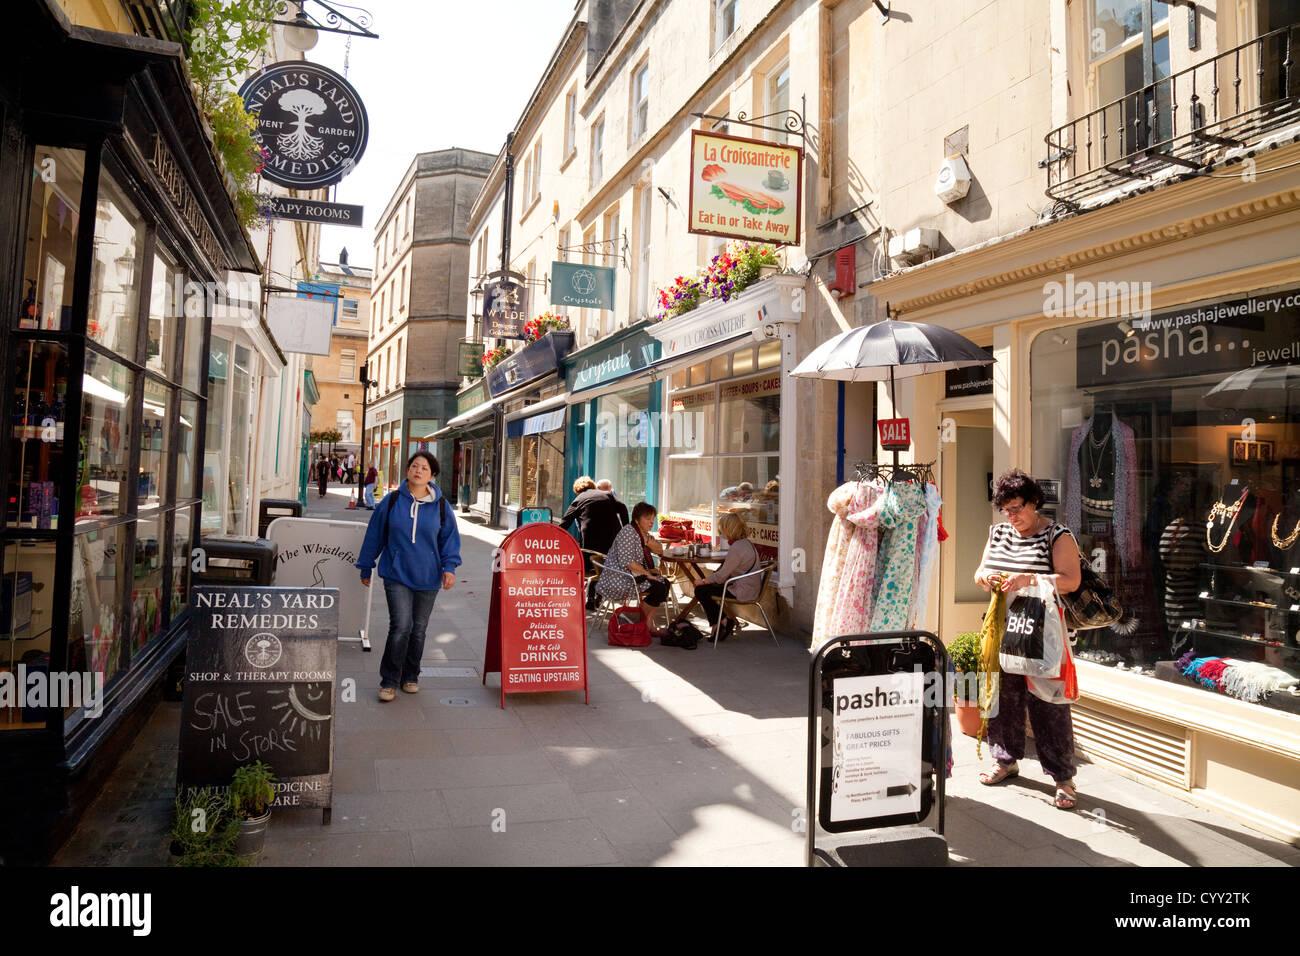 Street scene in summer , Northumberland Place, Bath city centre, Bath Somerset UK - Stock Image